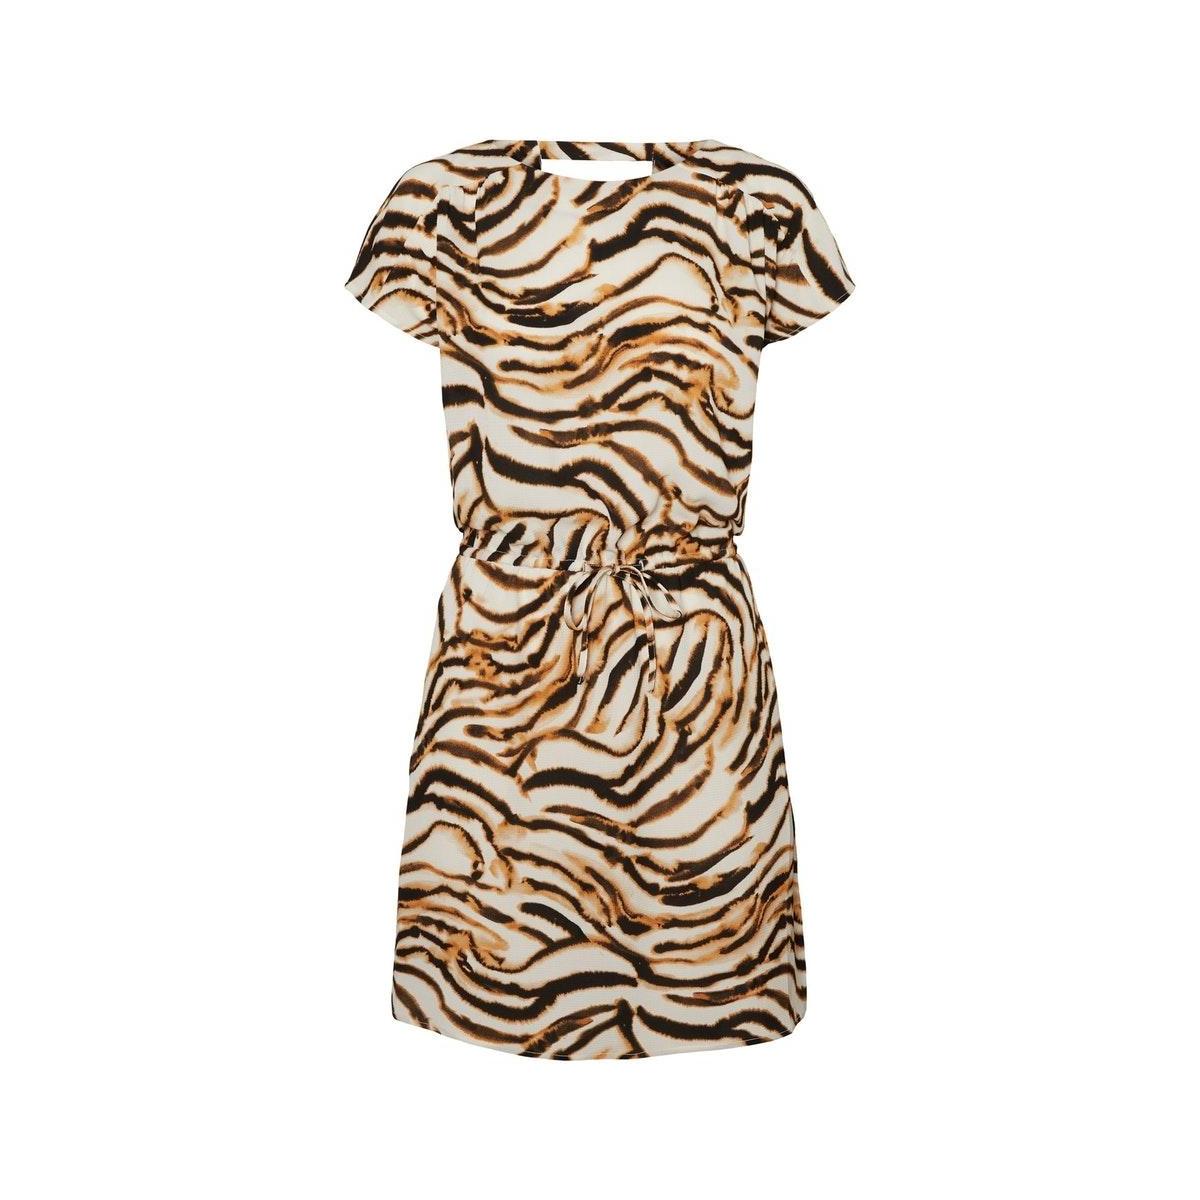 vmsasha bali s/s short dress aop 10224661 vero moda jurk meerkat/courtney